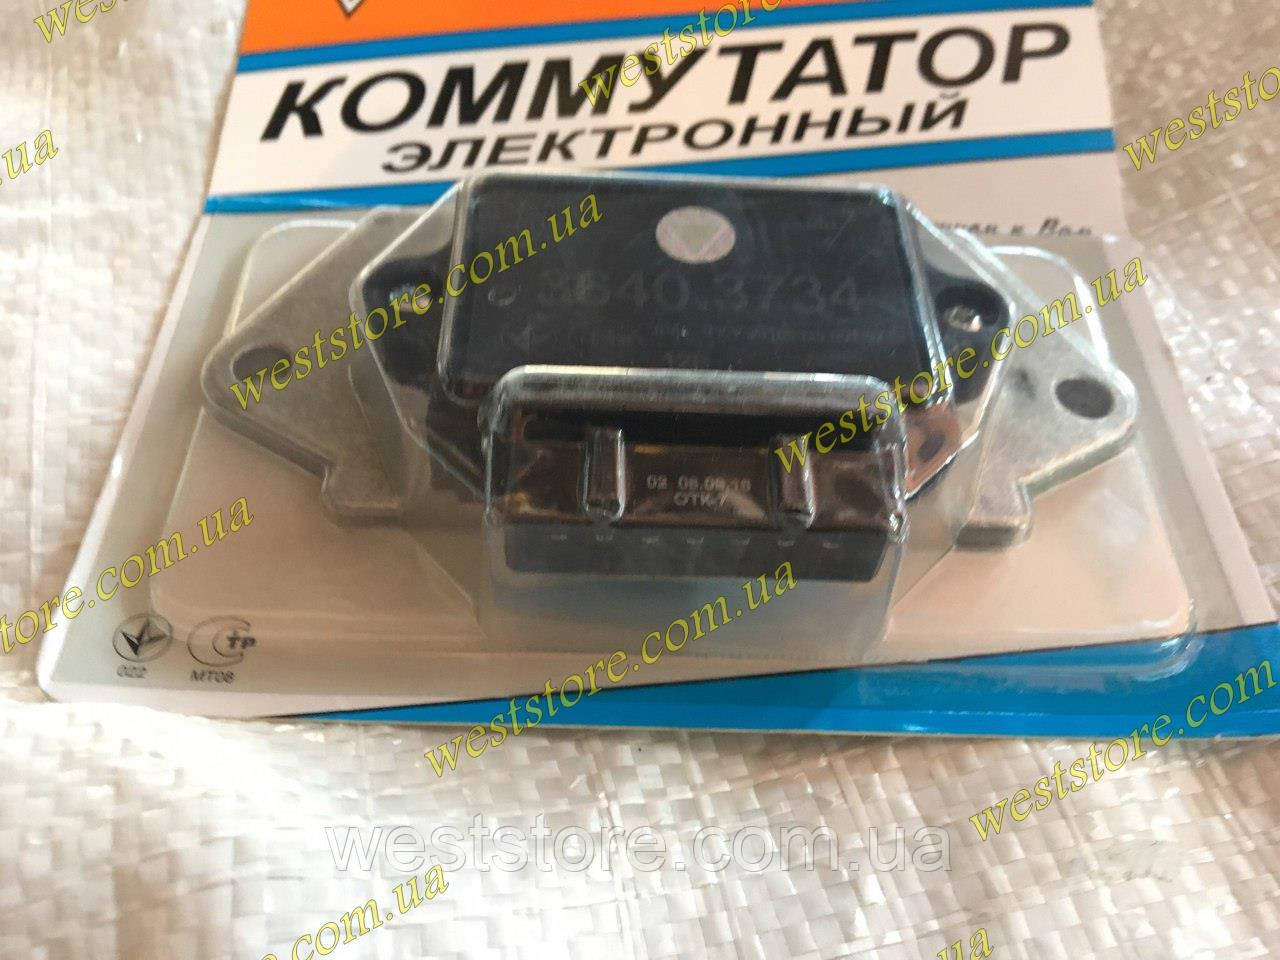 Коммутатор Ваз 2108 2109 21093 7-ножек с выходом  на тахометр ВТН 3640.3734